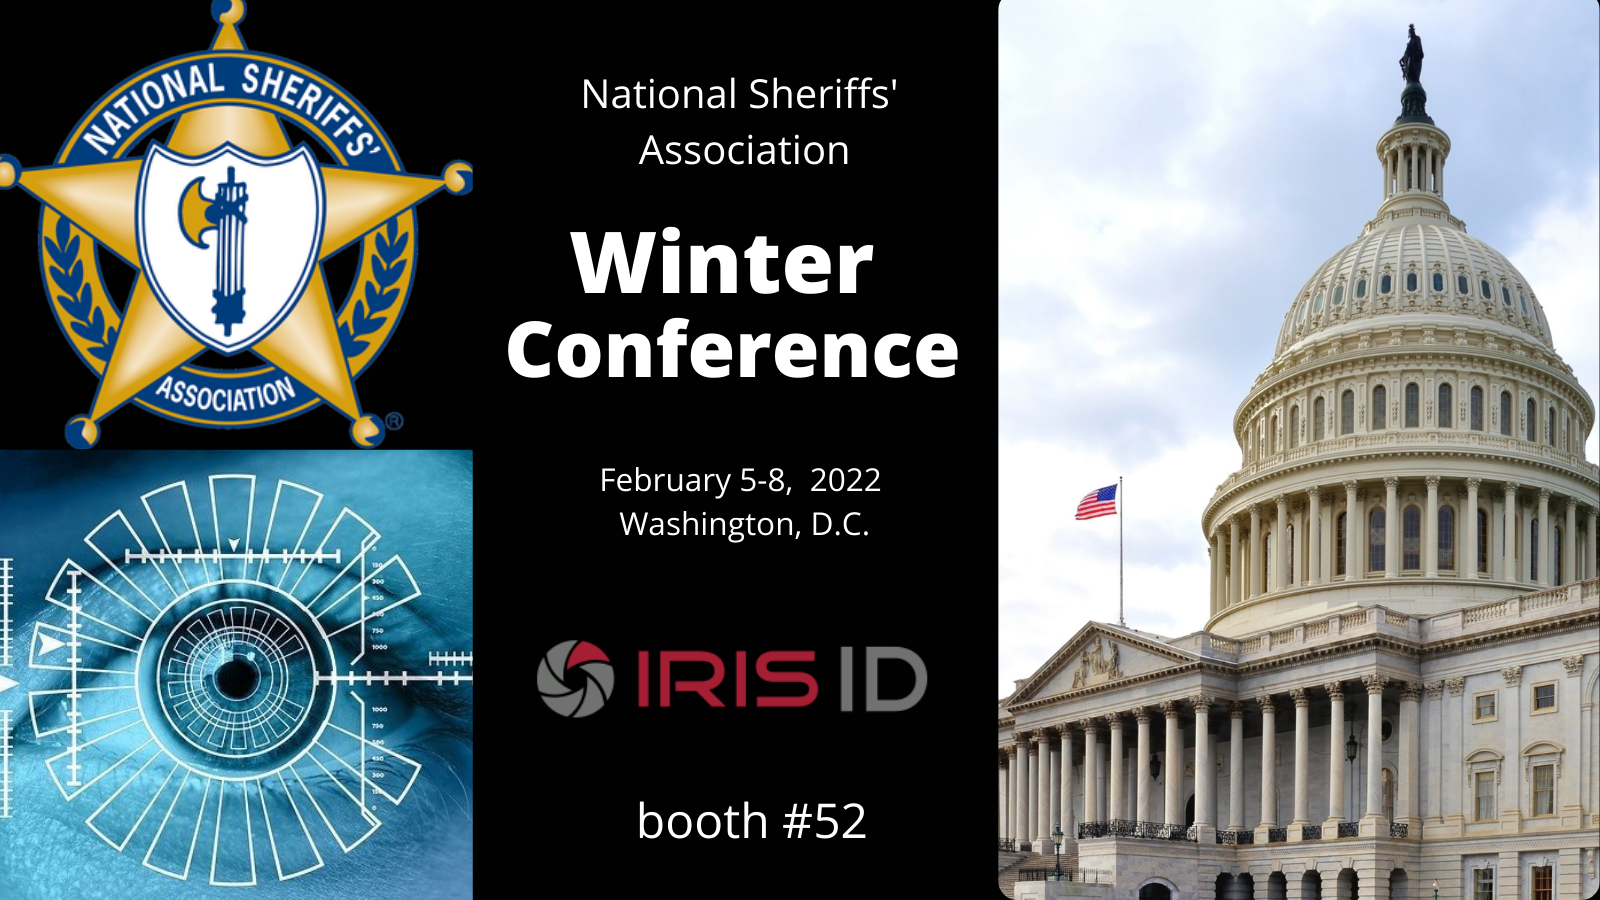 National Sheriffs' Association Winter Conference